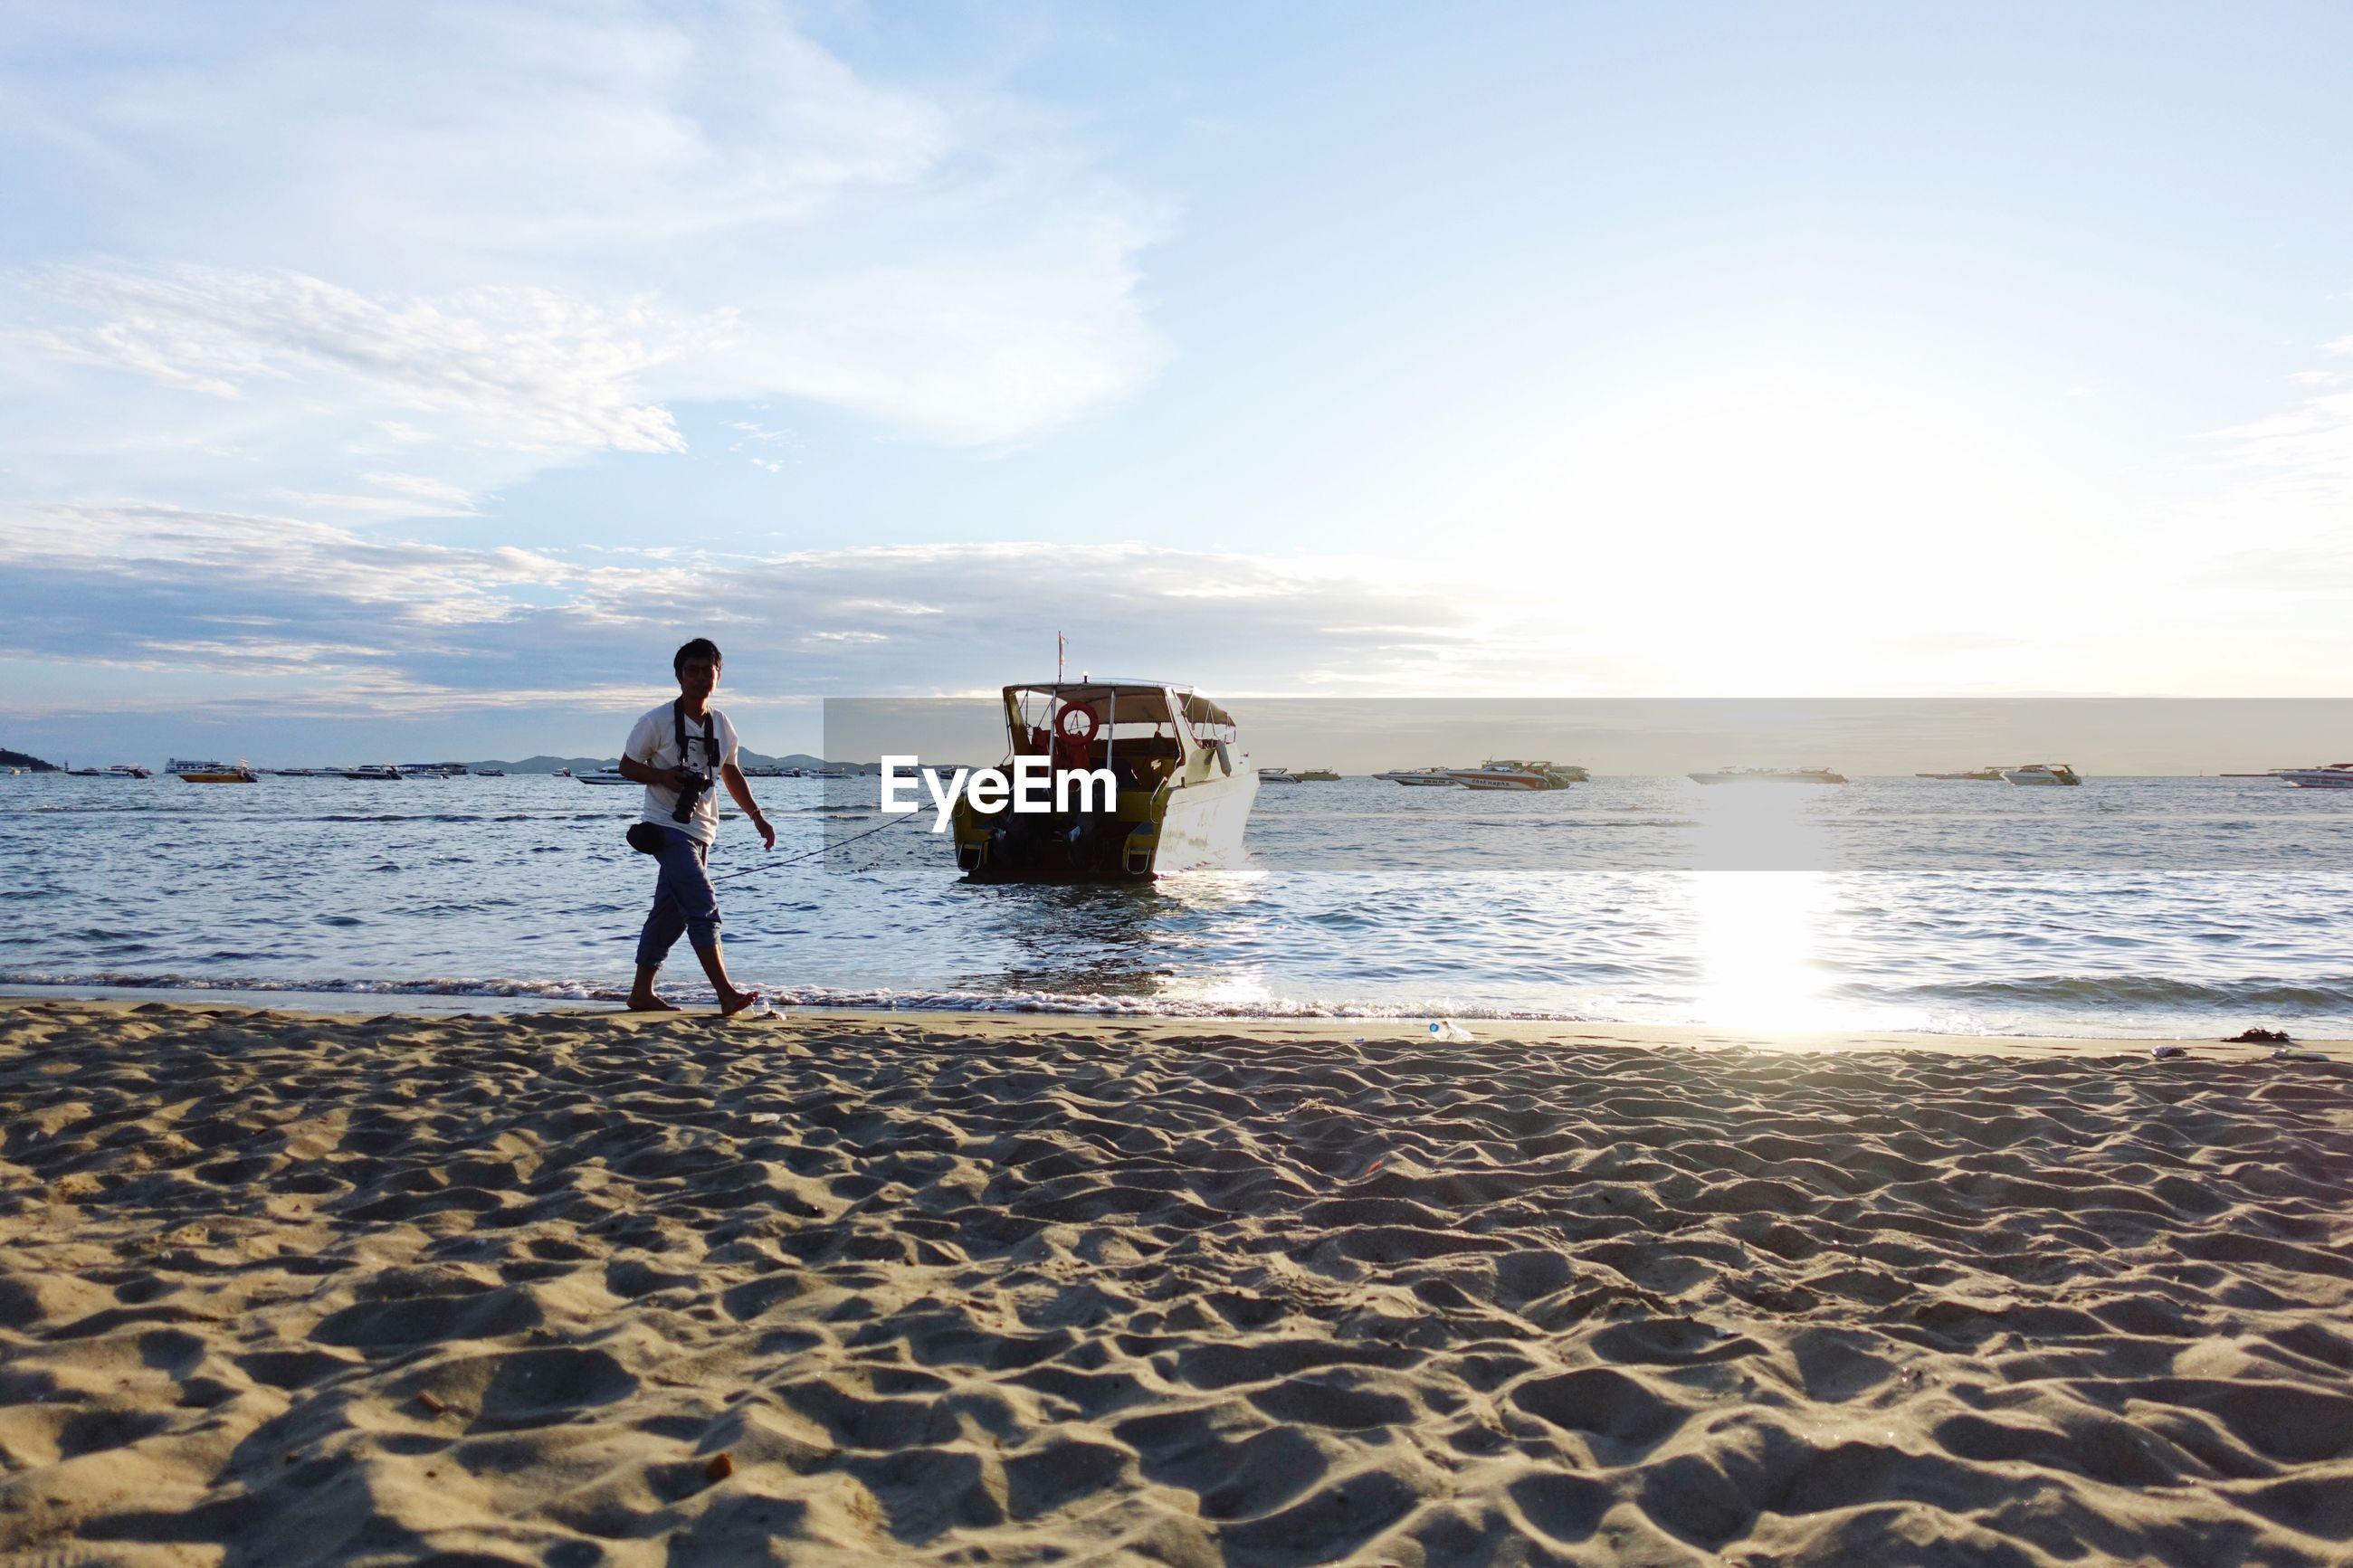 WOMAN STANDING ON BEACH AGAINST SEA AGAINST SKY